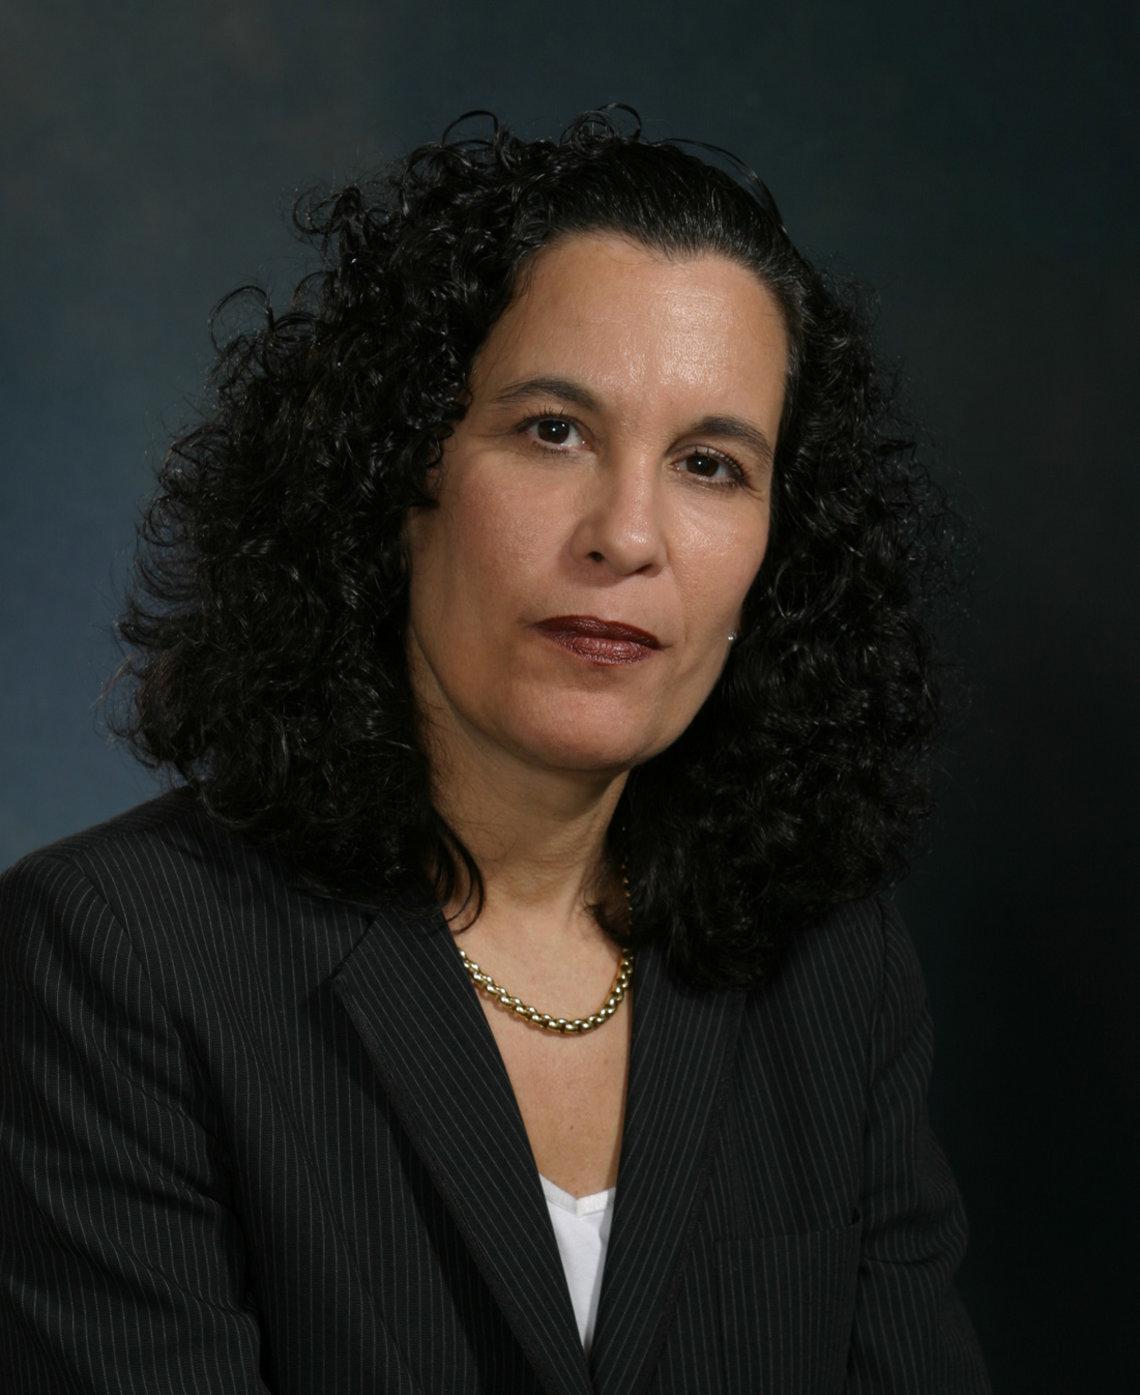 Hon. Shelley C. Chapman